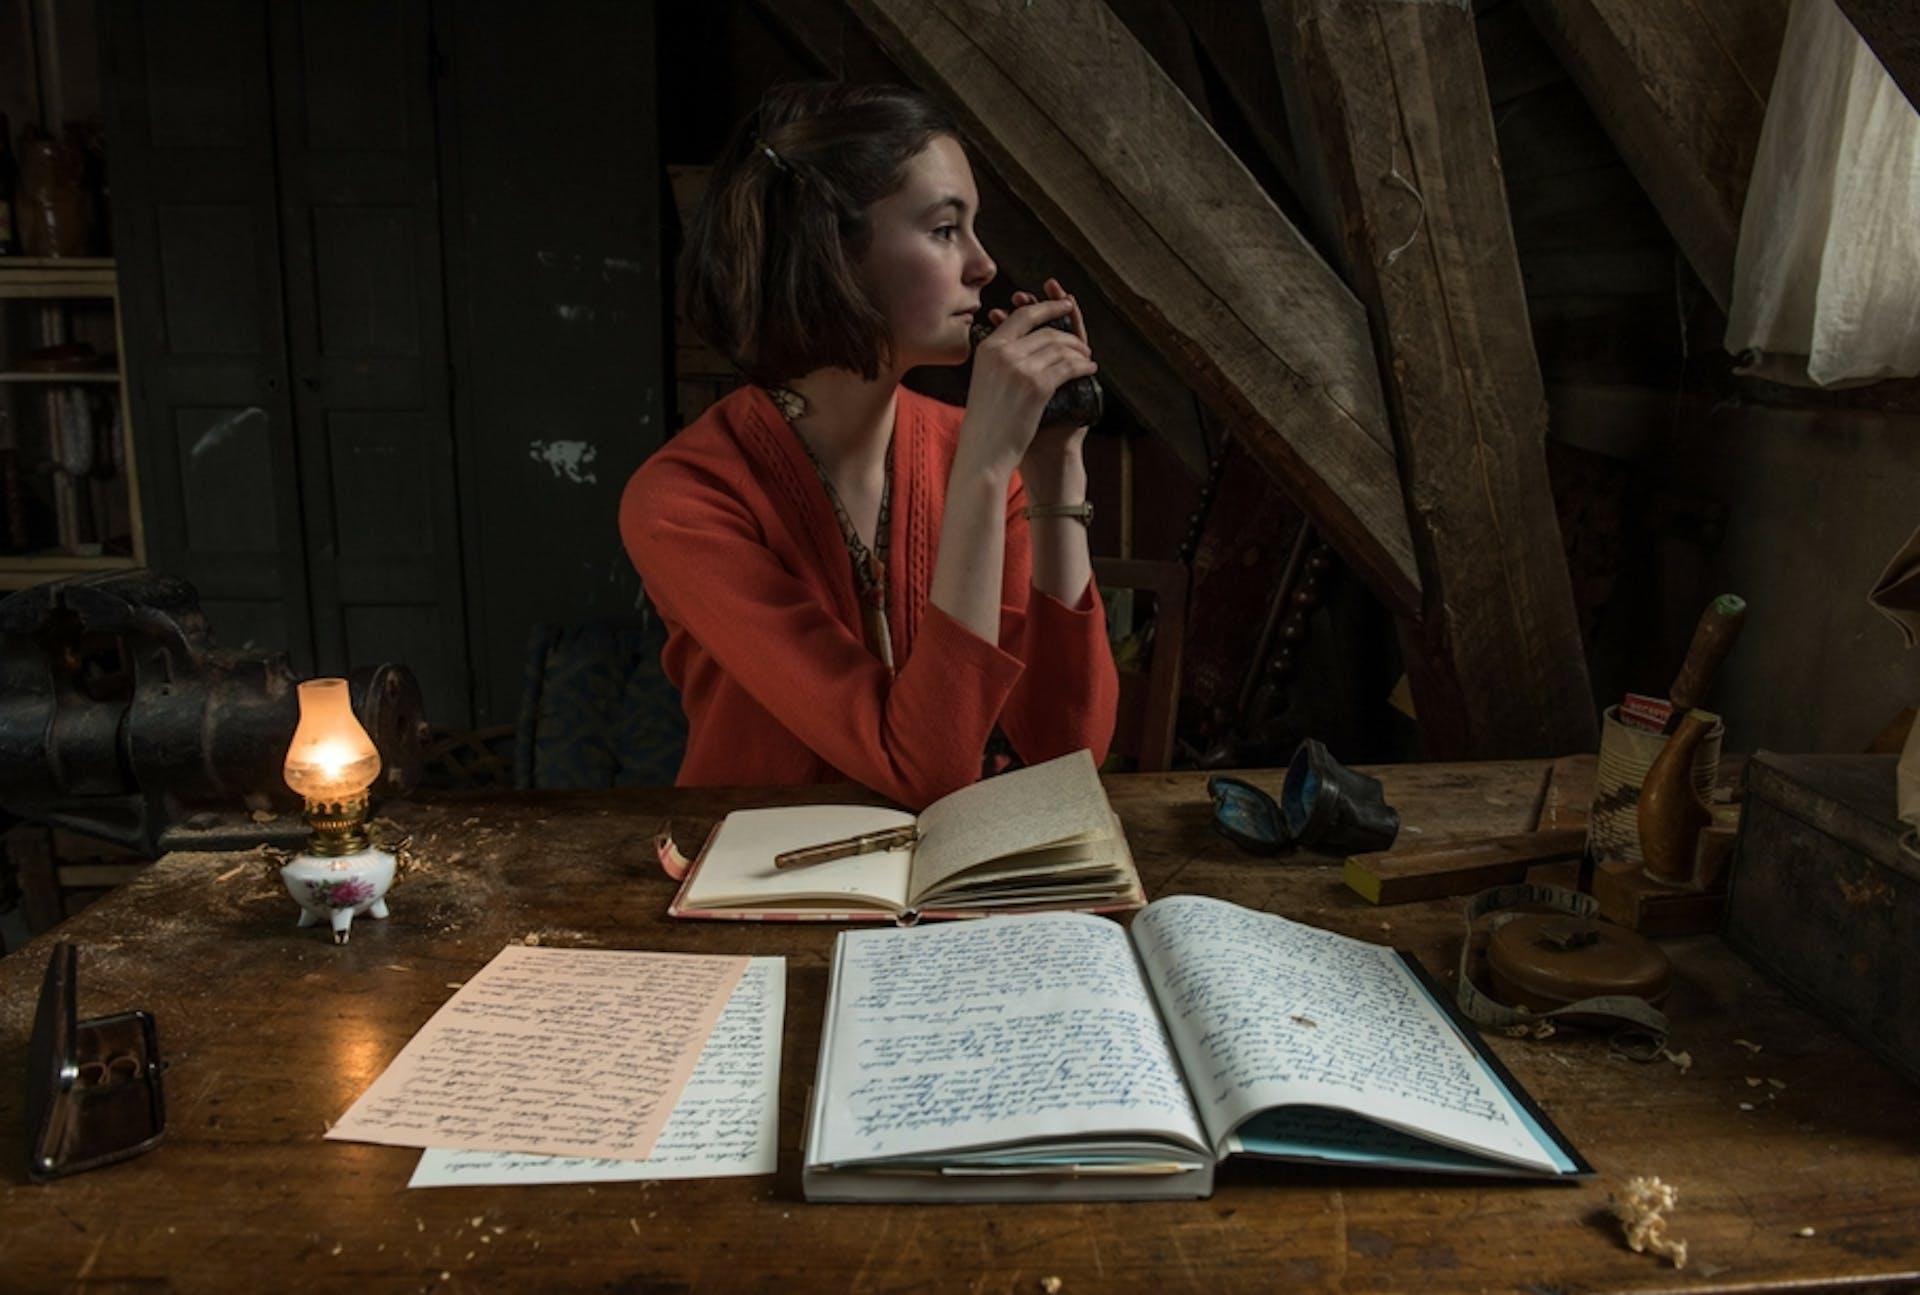 The Diary Of Anne Frank (Das Tagebuch der Anne Frank)